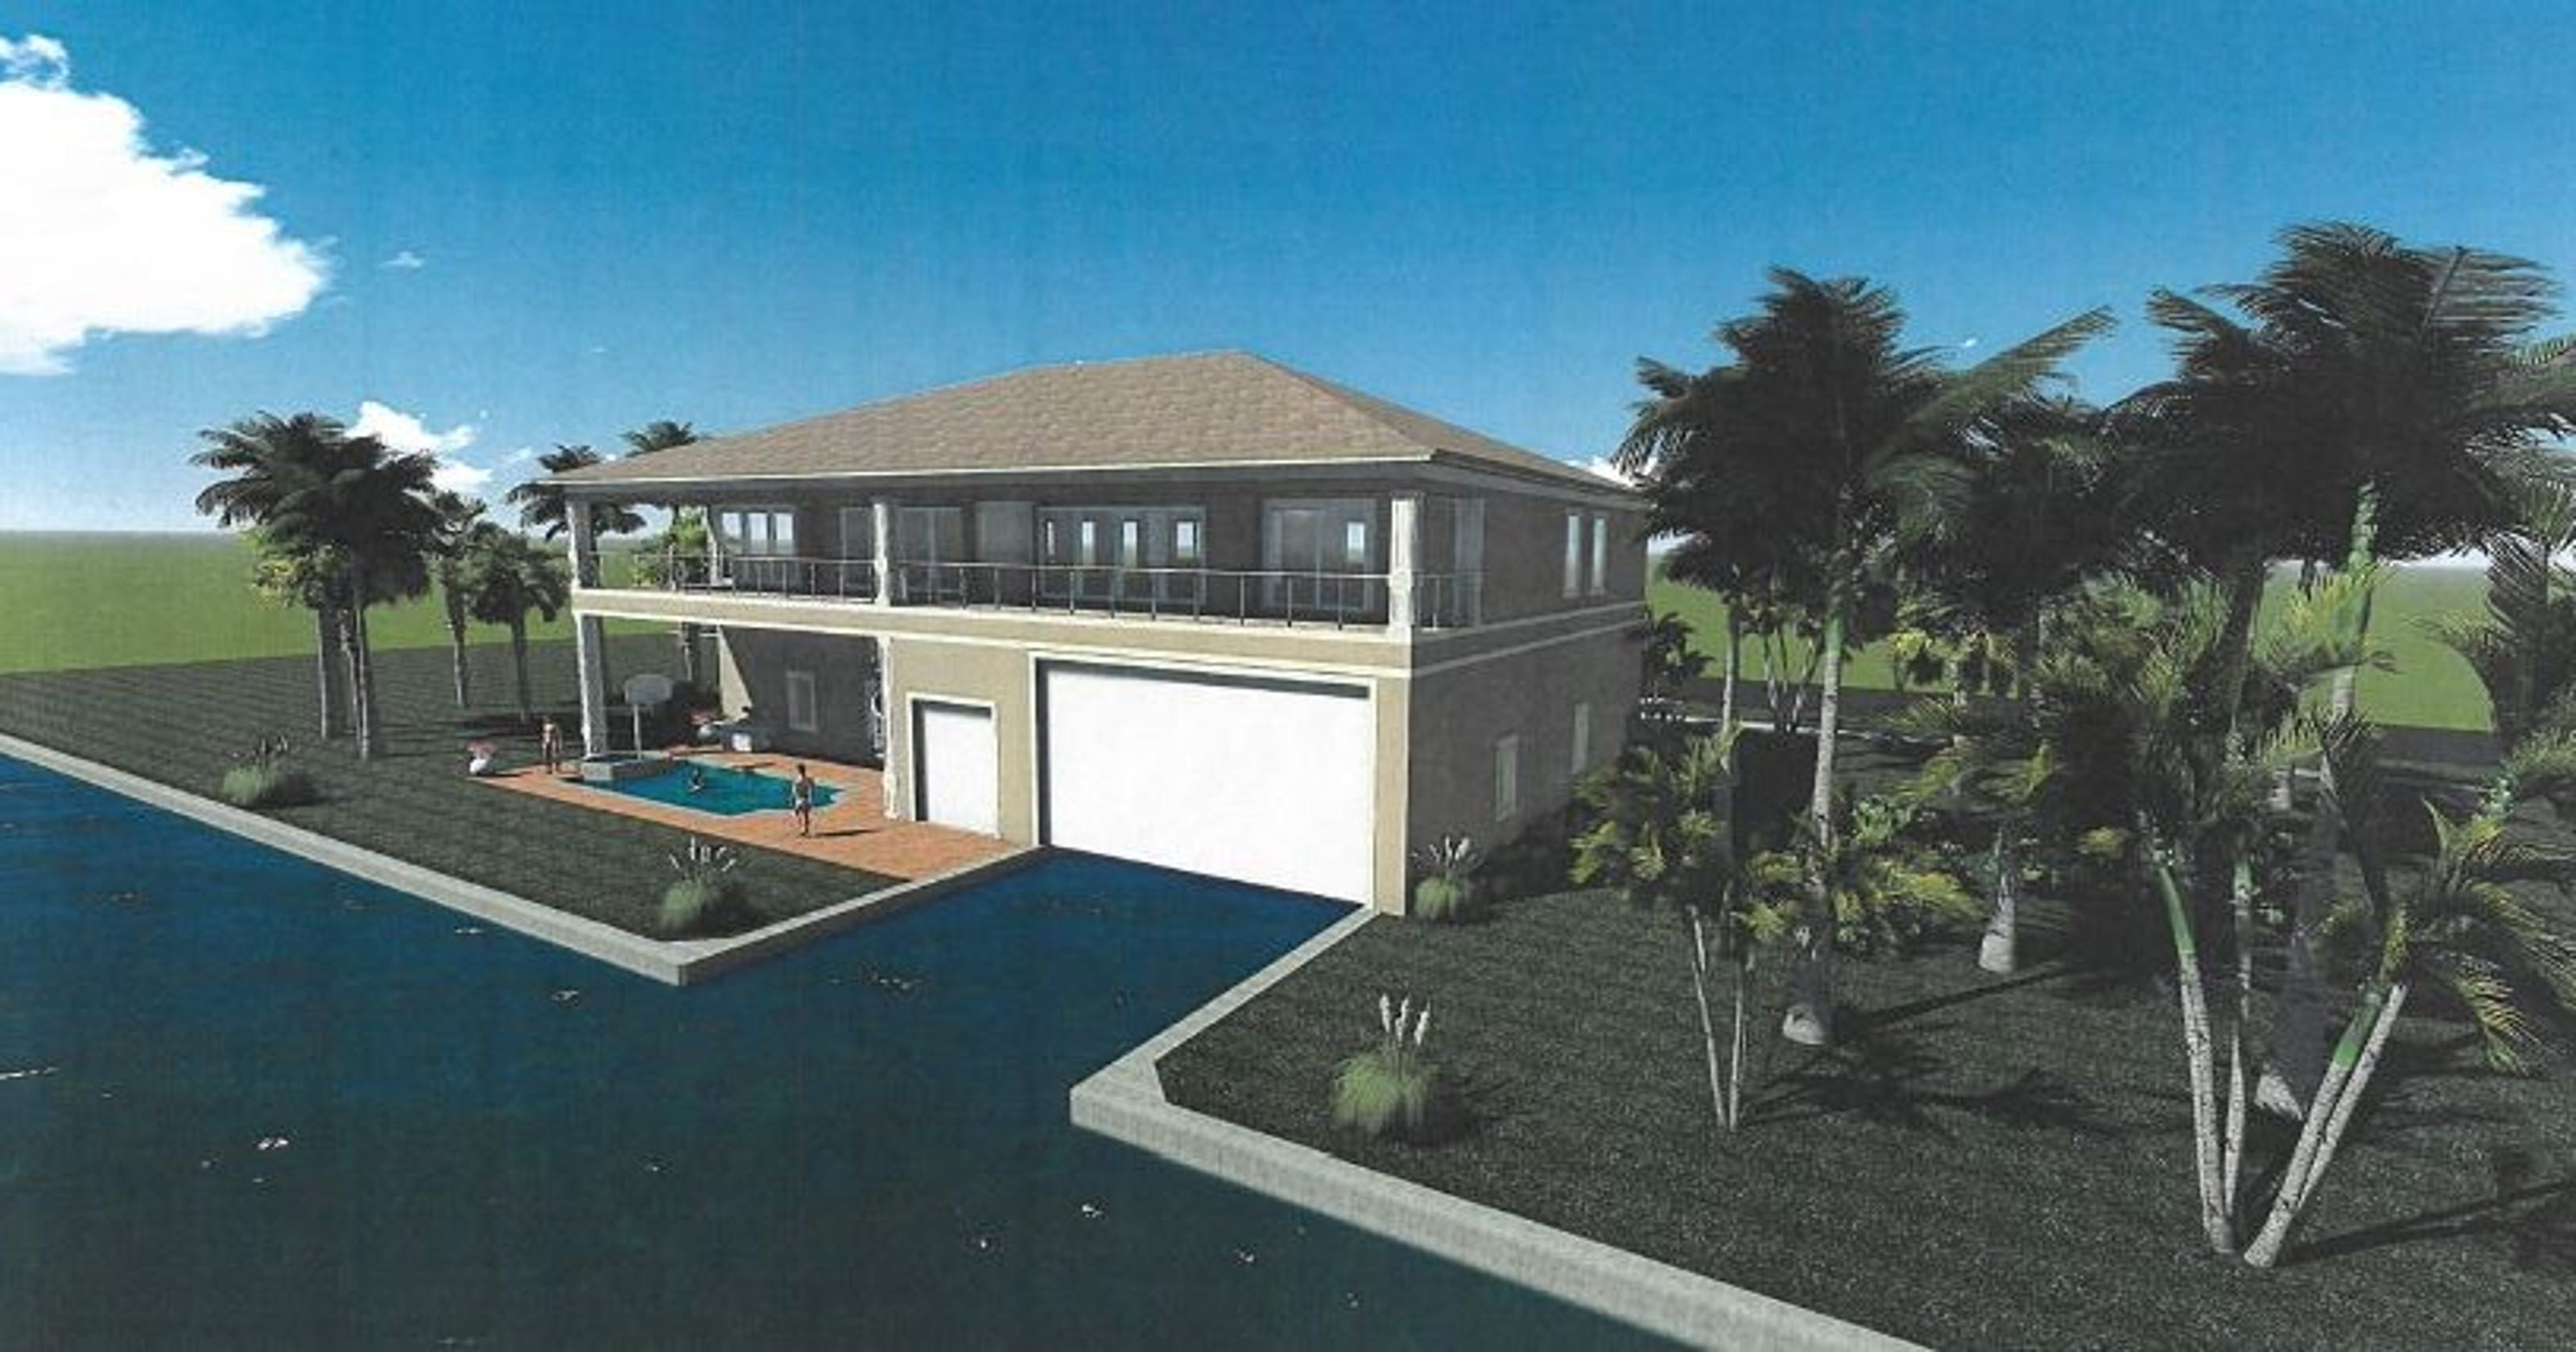 Marco Island Planning Board